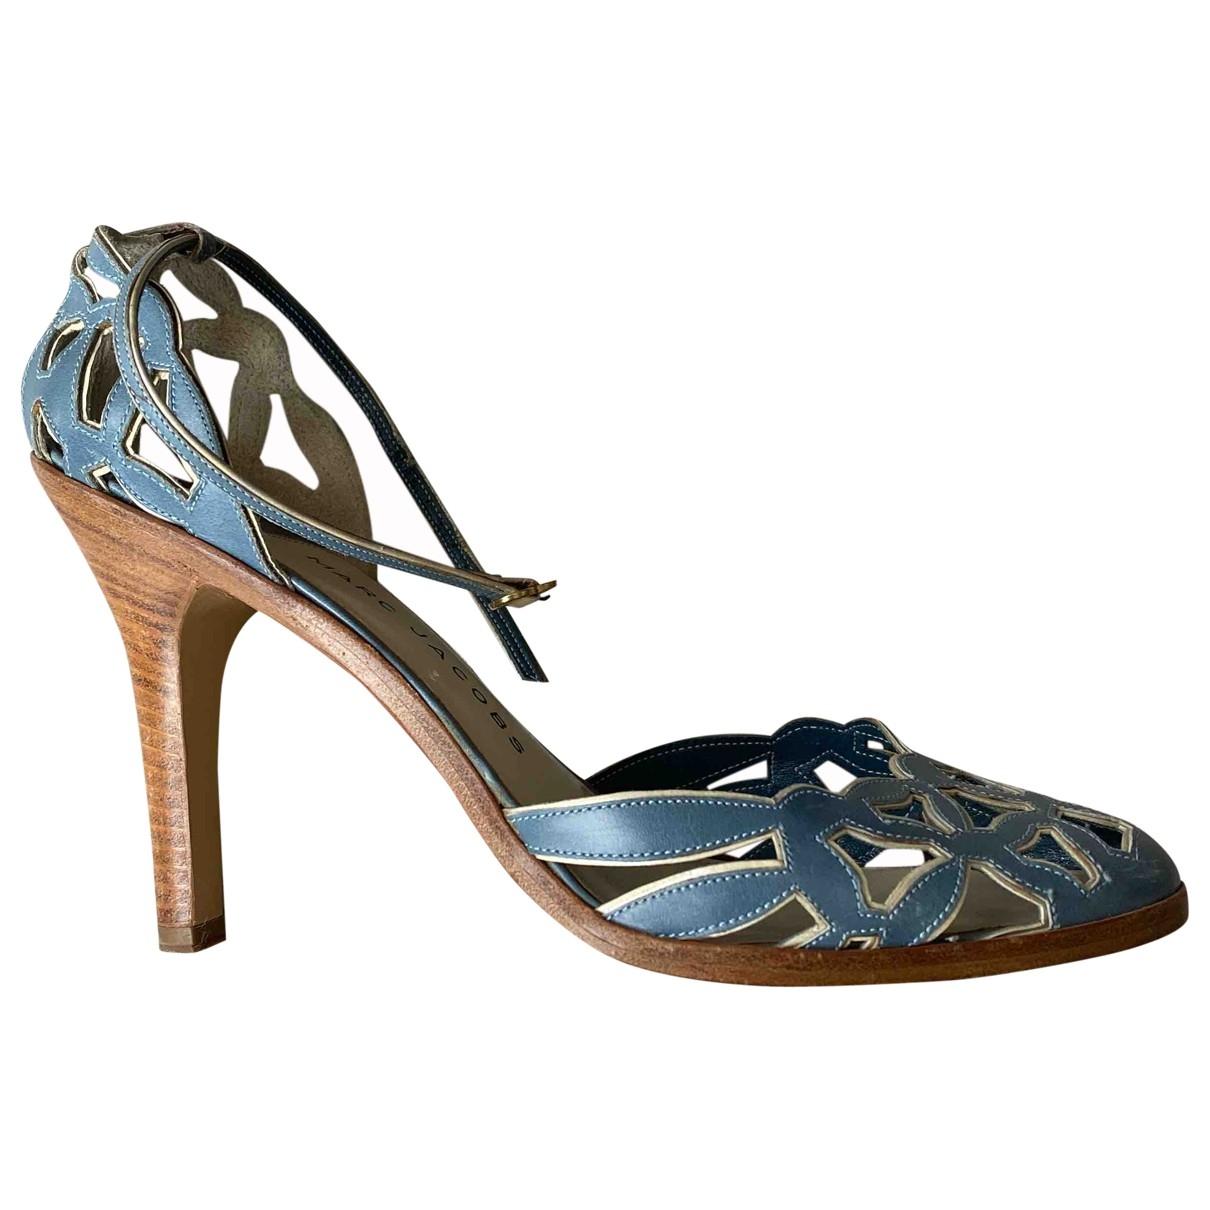 Sandalias de Cuero Marc Jacobs